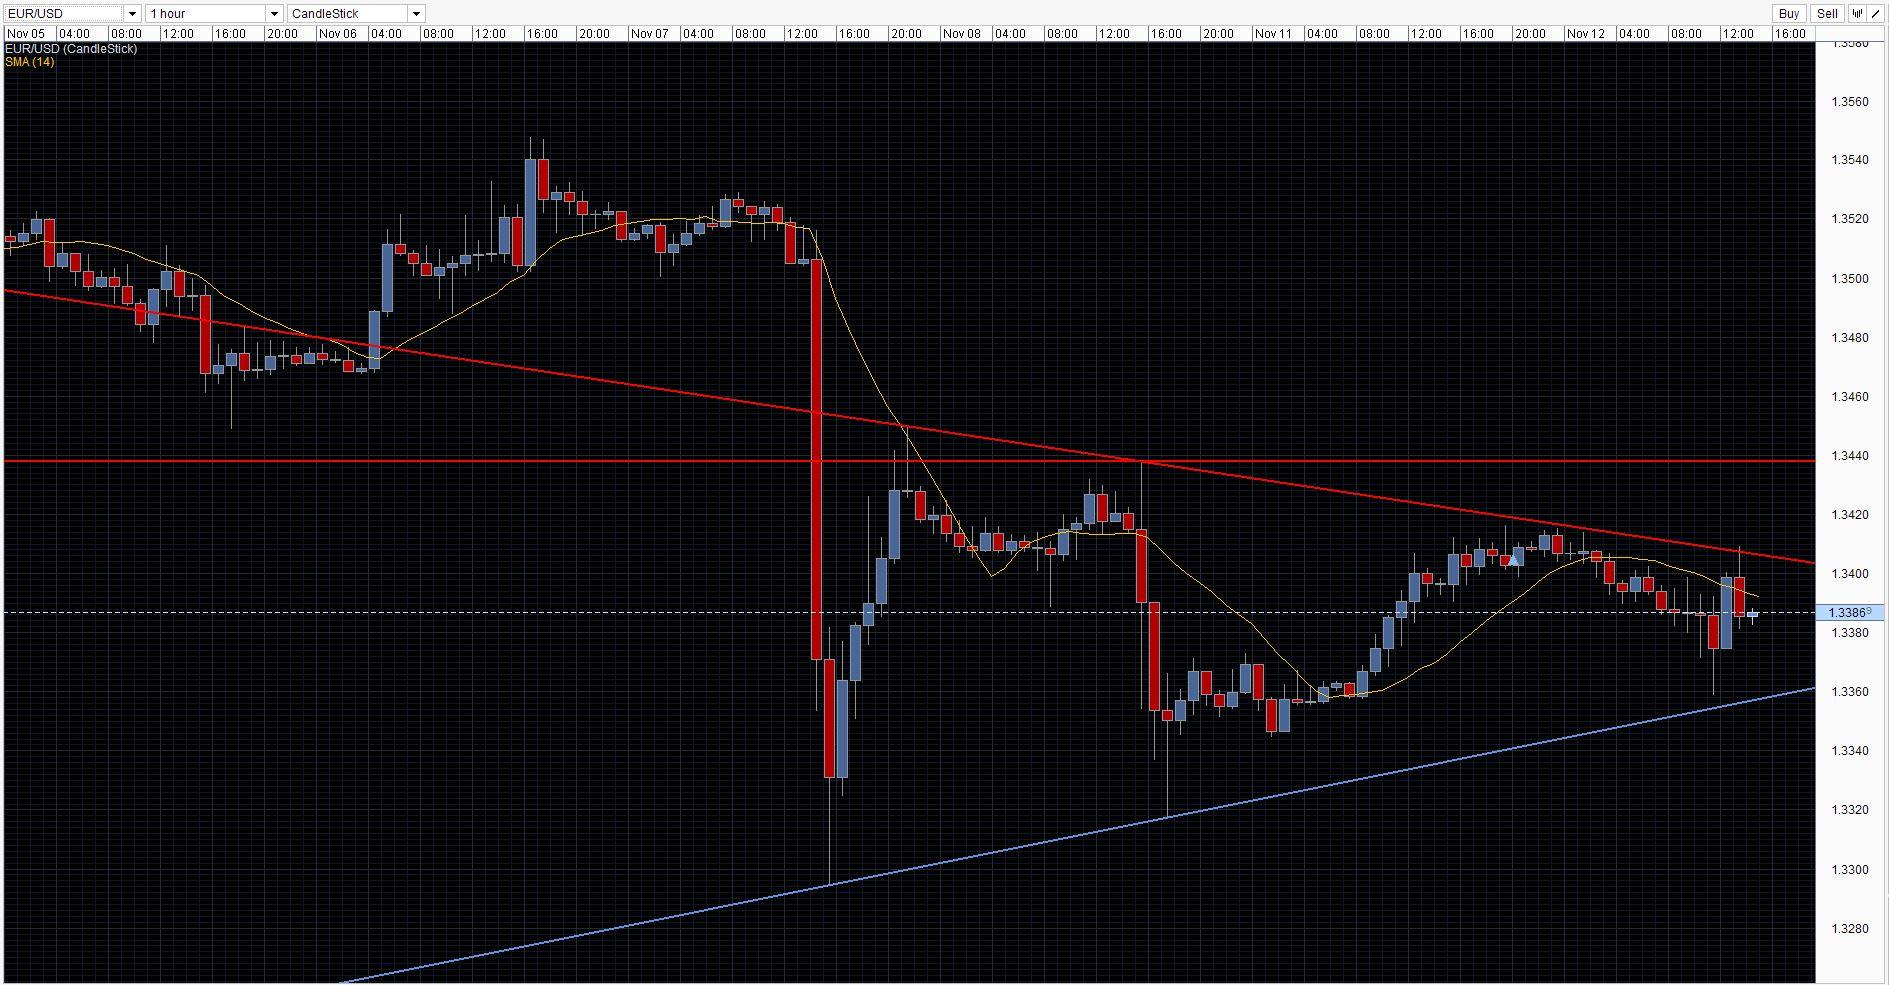 EUR/USD Chart 12/11/2013